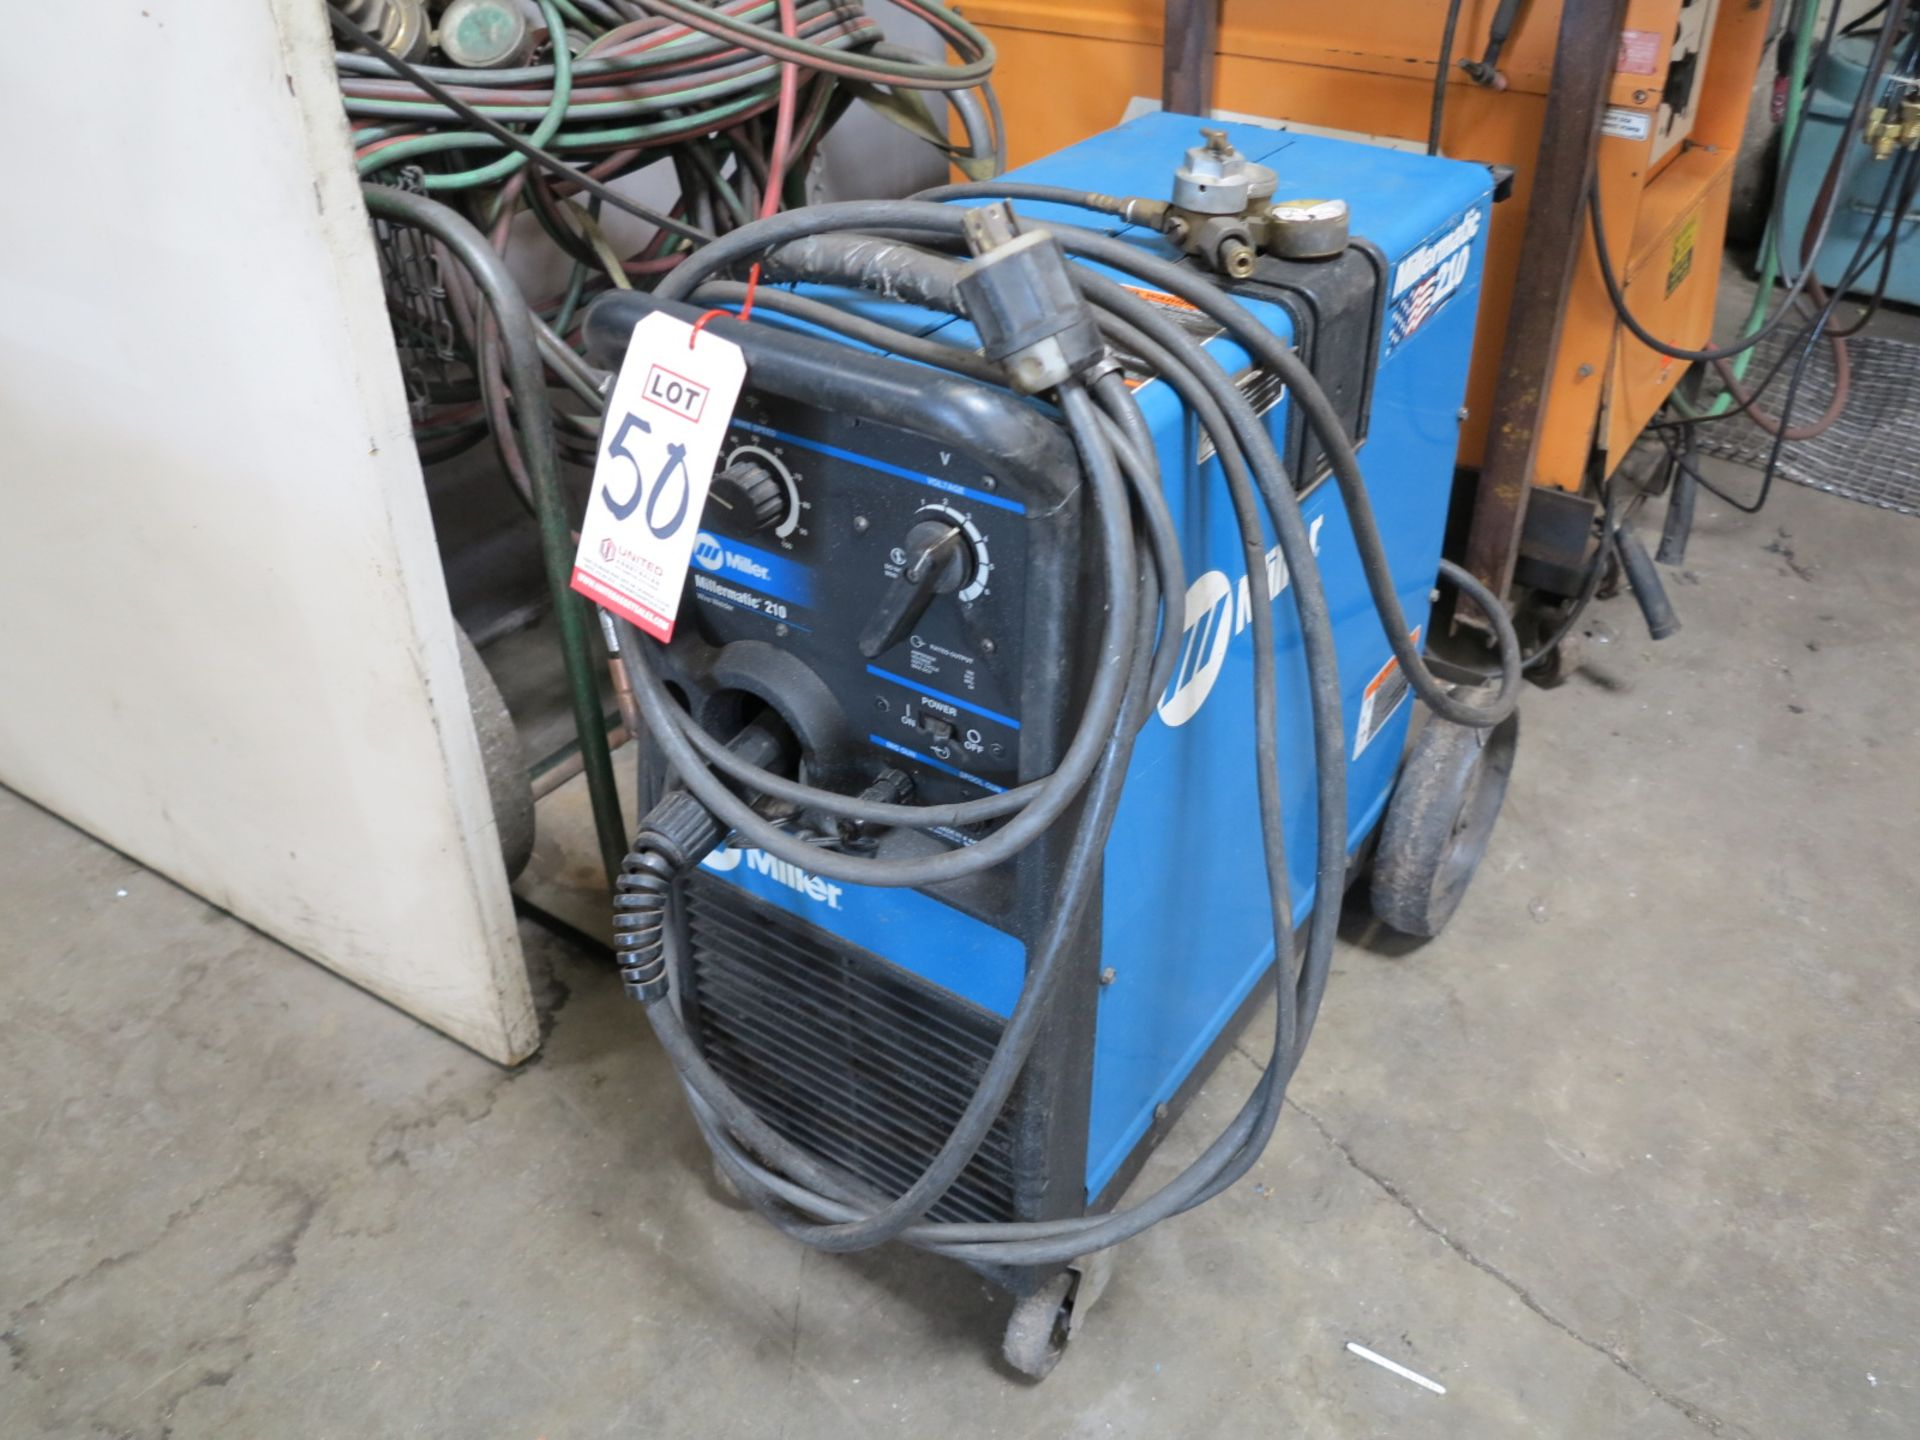 Lot 50 - MILLERMATIC 210 WIRE WELDER, STOCK NO. 907046, S/N LG341038B